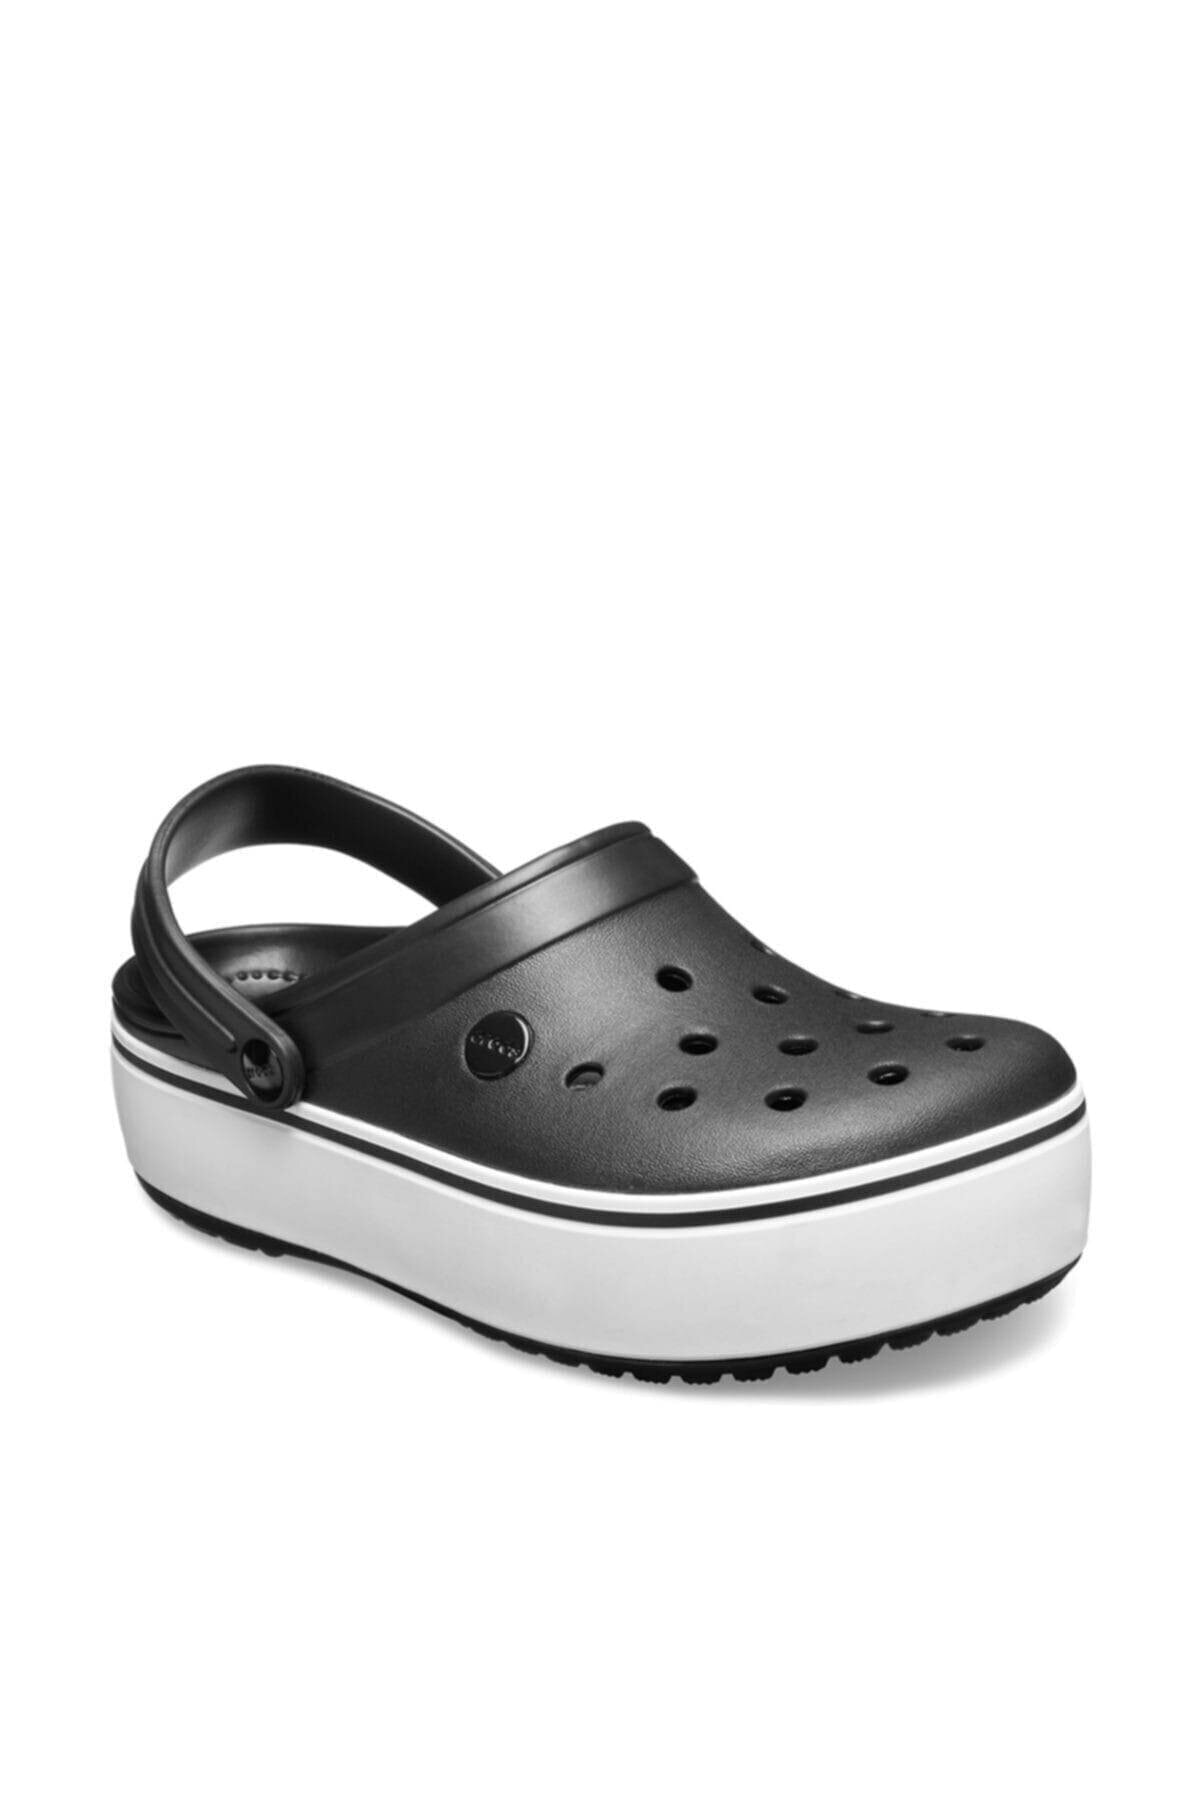 Crocs Kadın Siyah Platform Terlik 205434 1